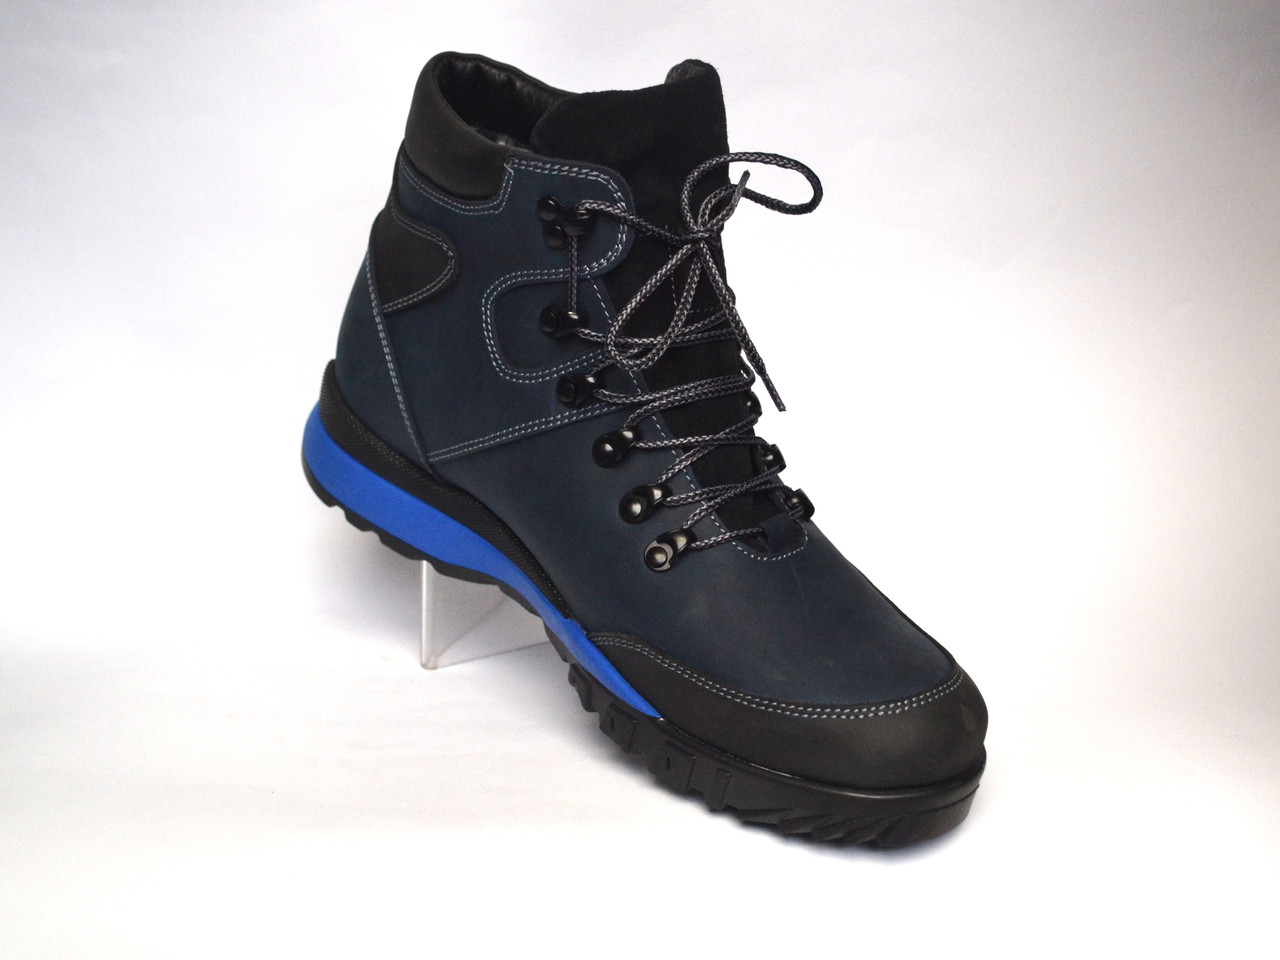 aaeaf30e480e Кожаные зимние мужские ботинки Rosso Avangard Lomerback Bluline синие 43 -